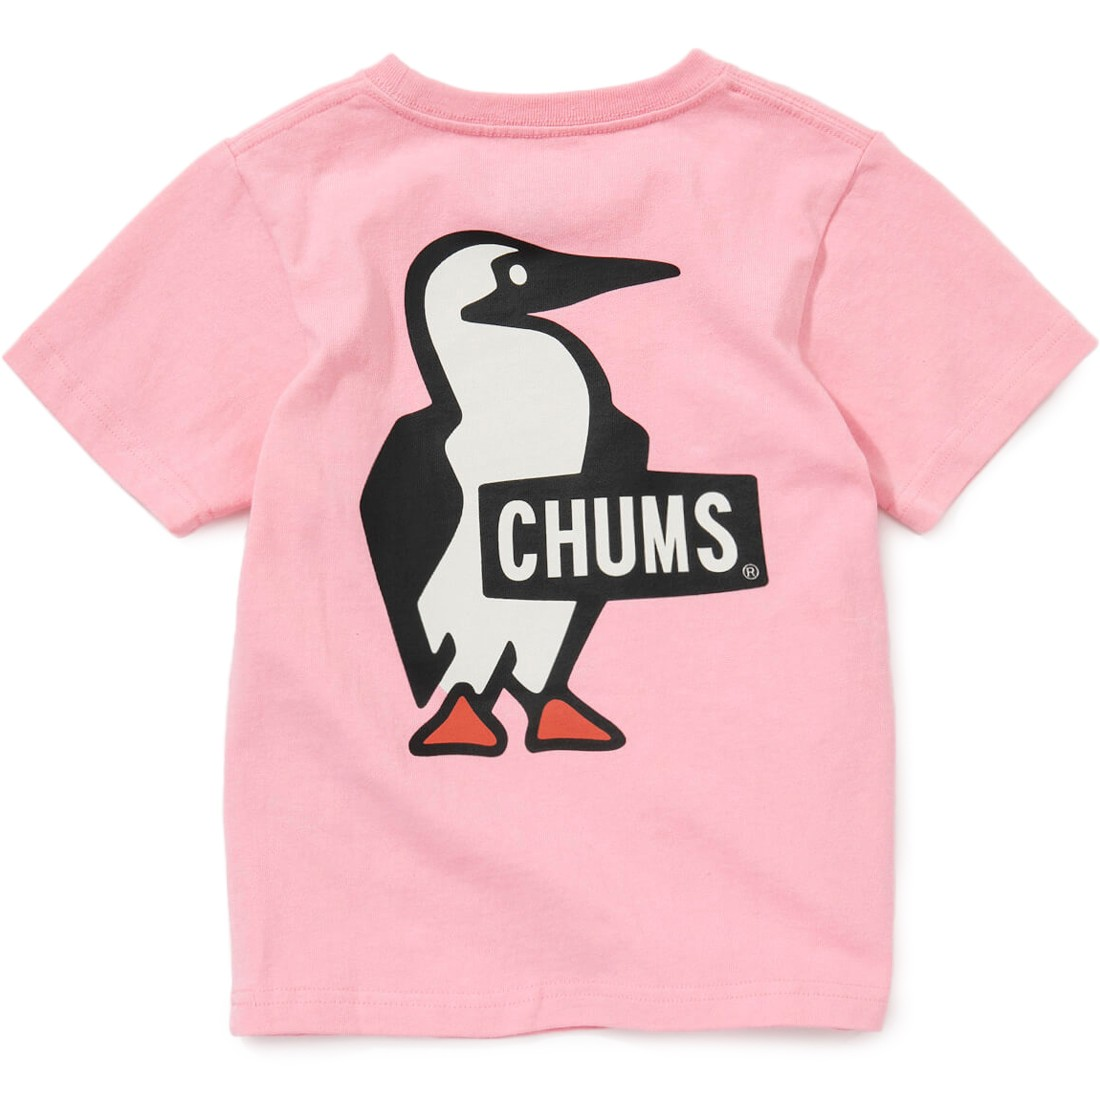 CHUMS Kid's Booby Logo T-Shirt